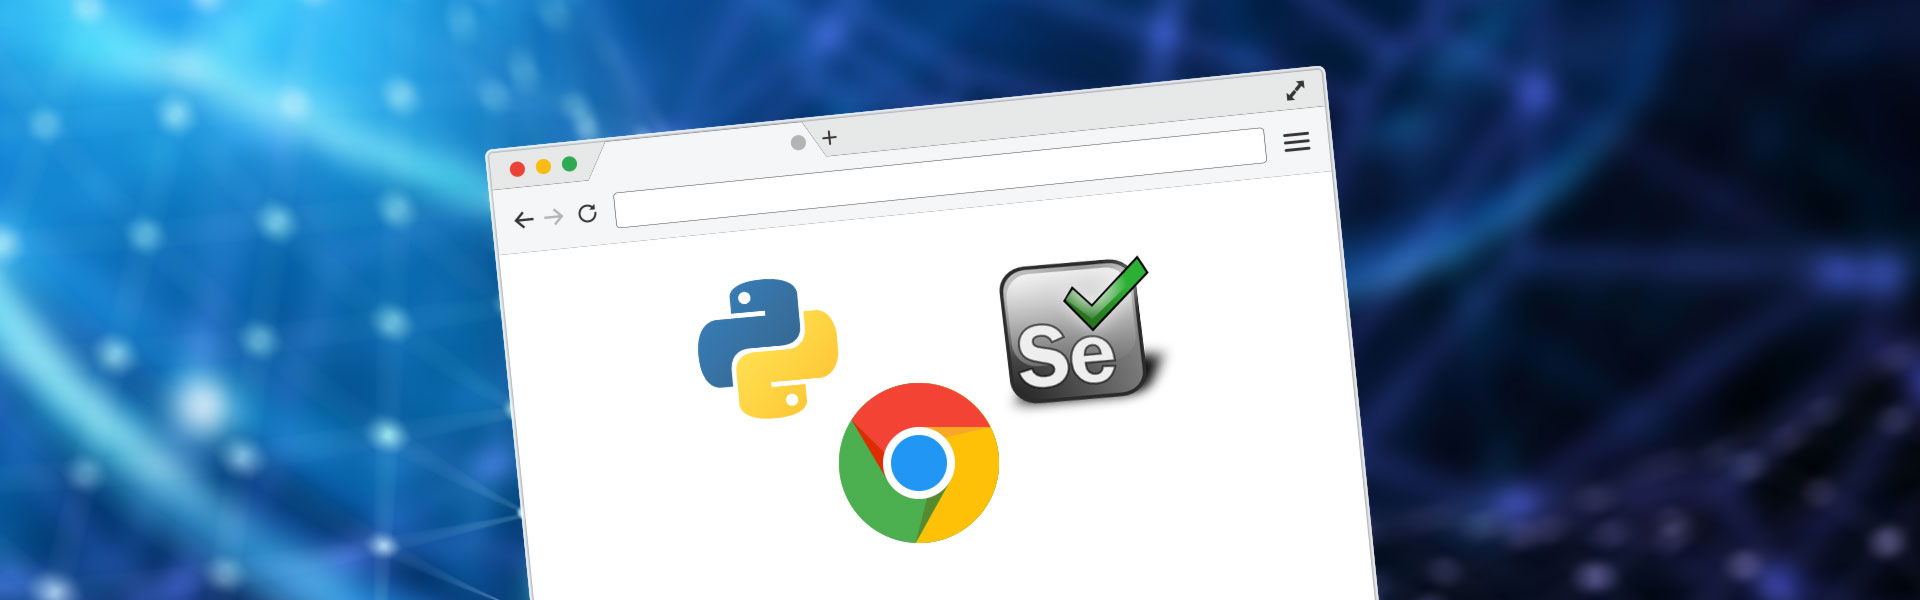 Installing Selenium WebDriver Using Python and Chrome